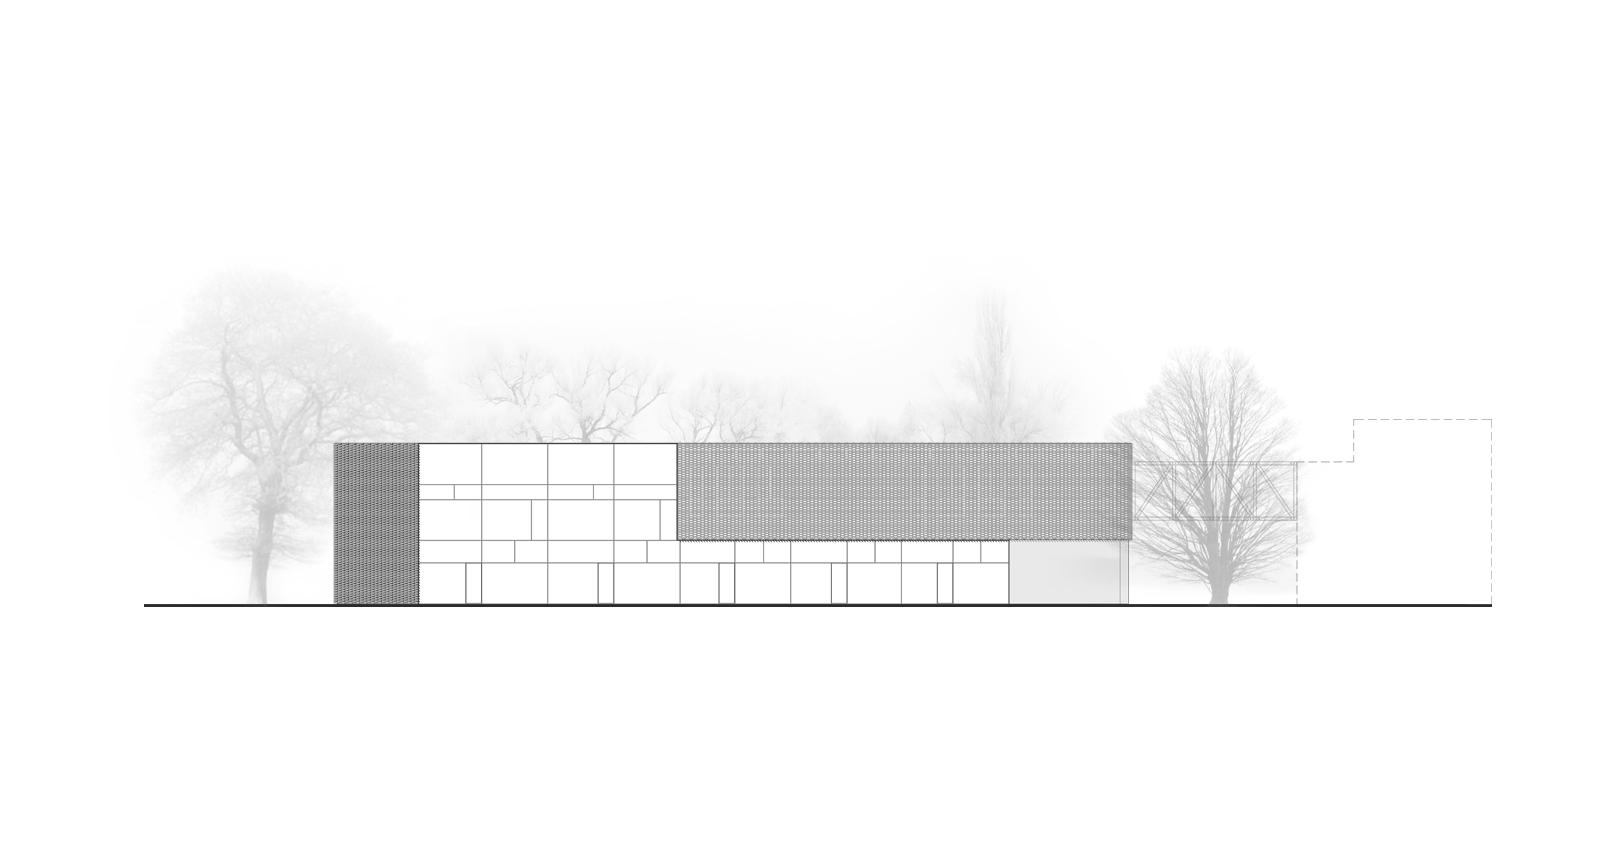 scuole-innovative-ferrara-elevation-01